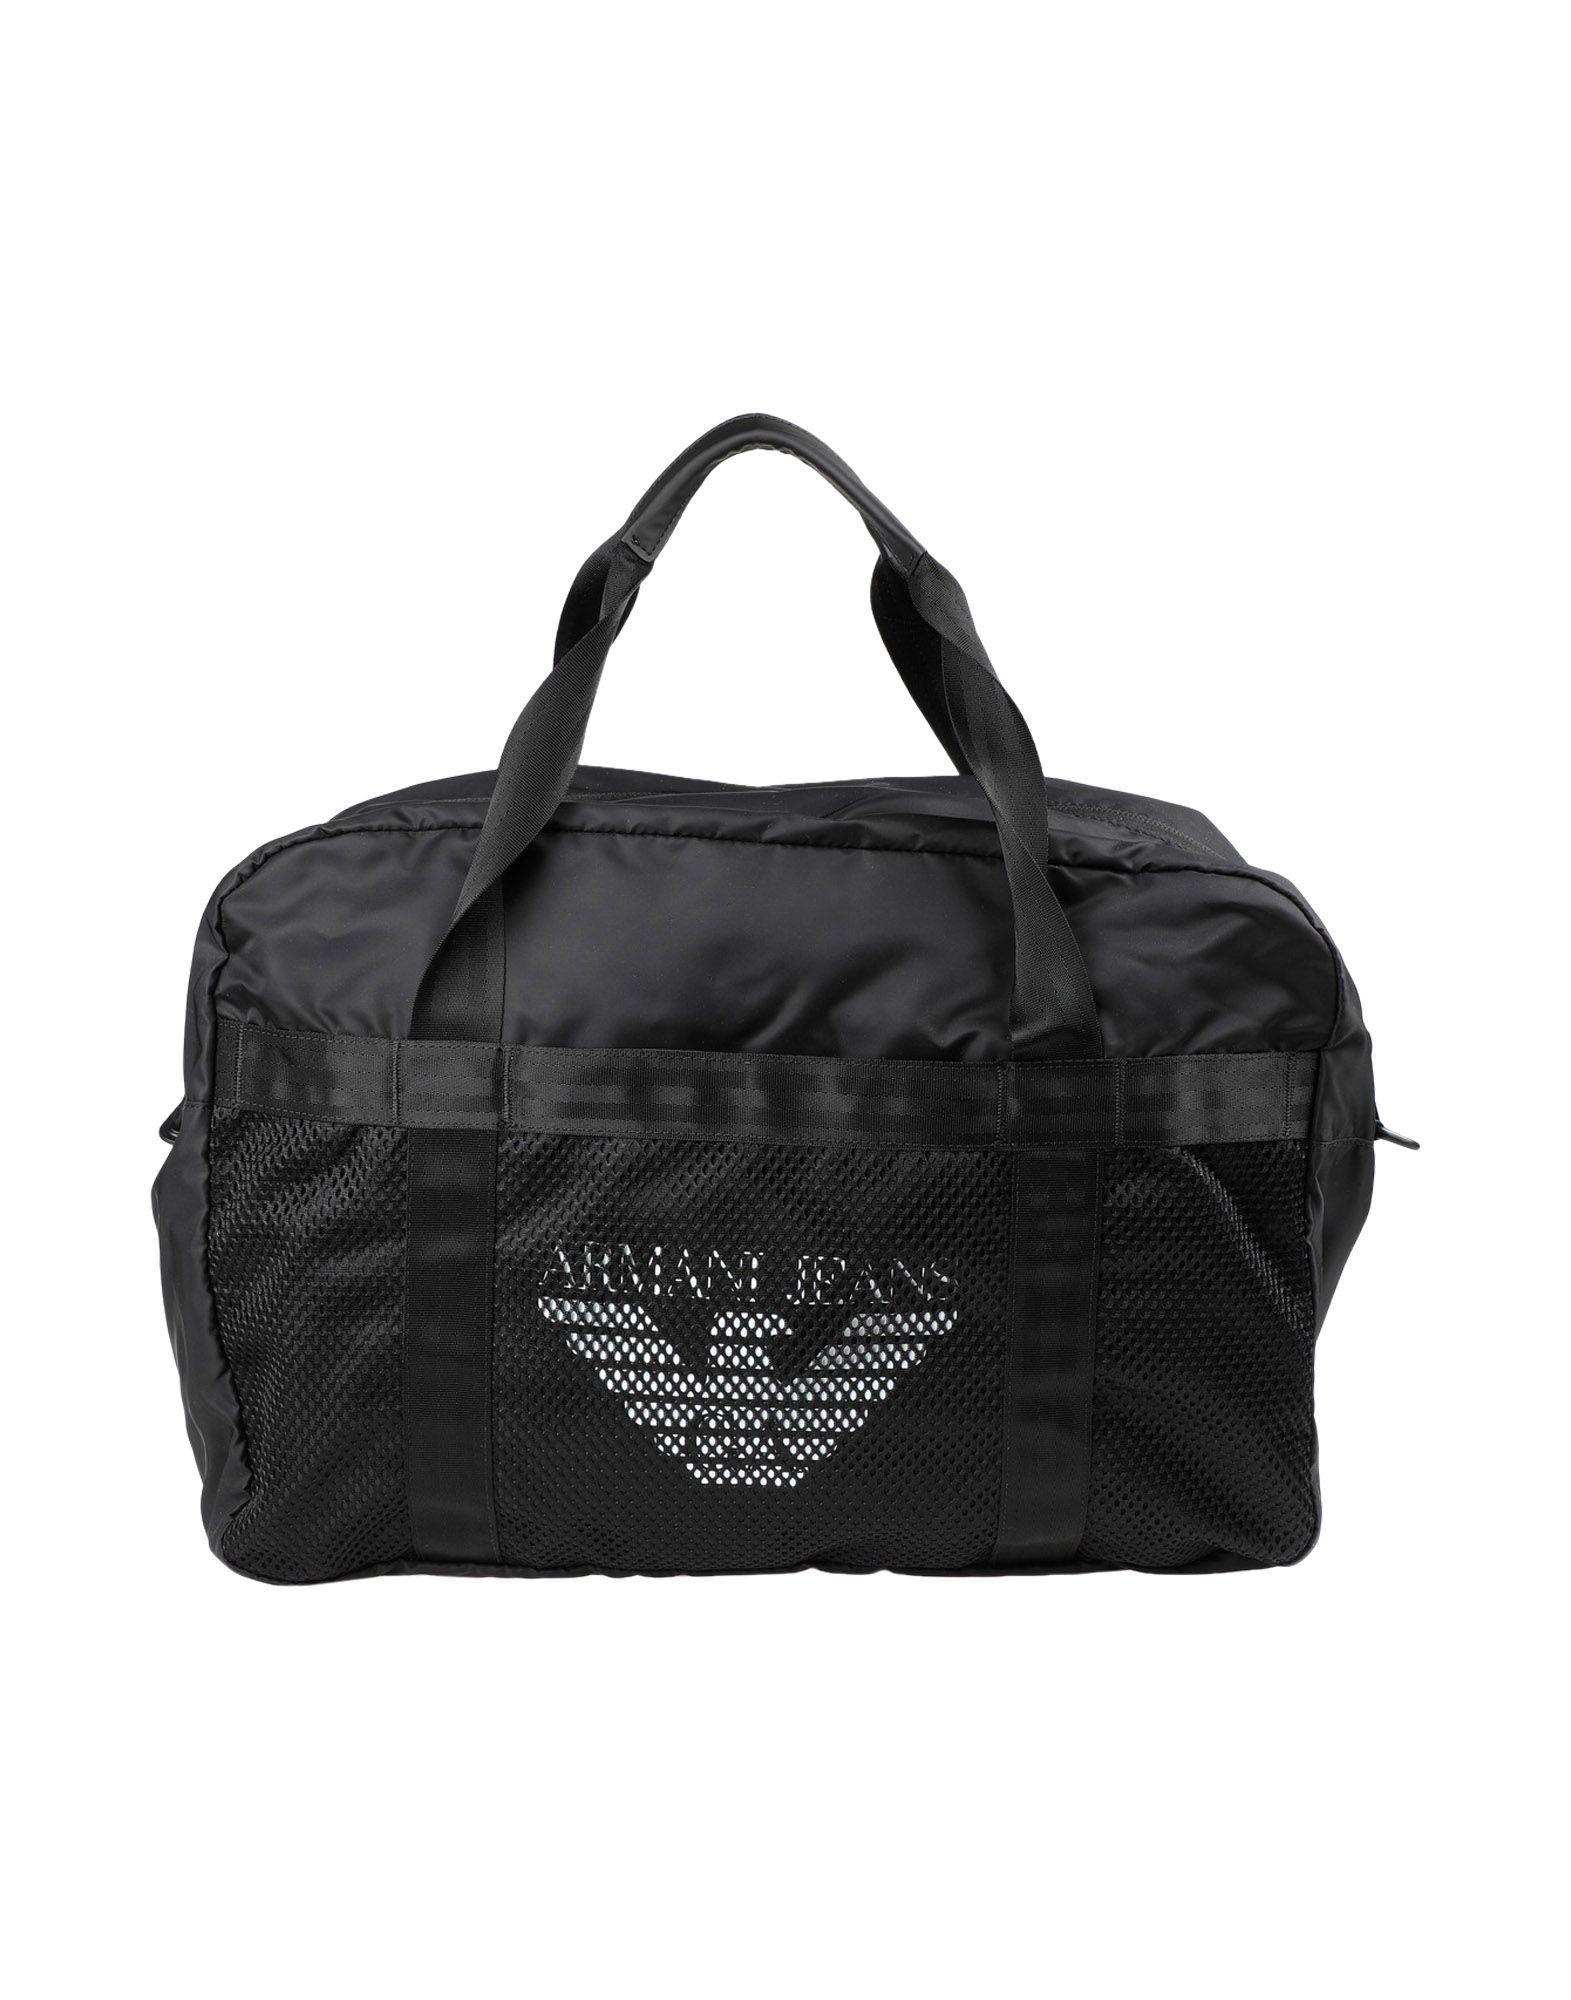 Armani Jeans Travel & Duffel Bag In Black